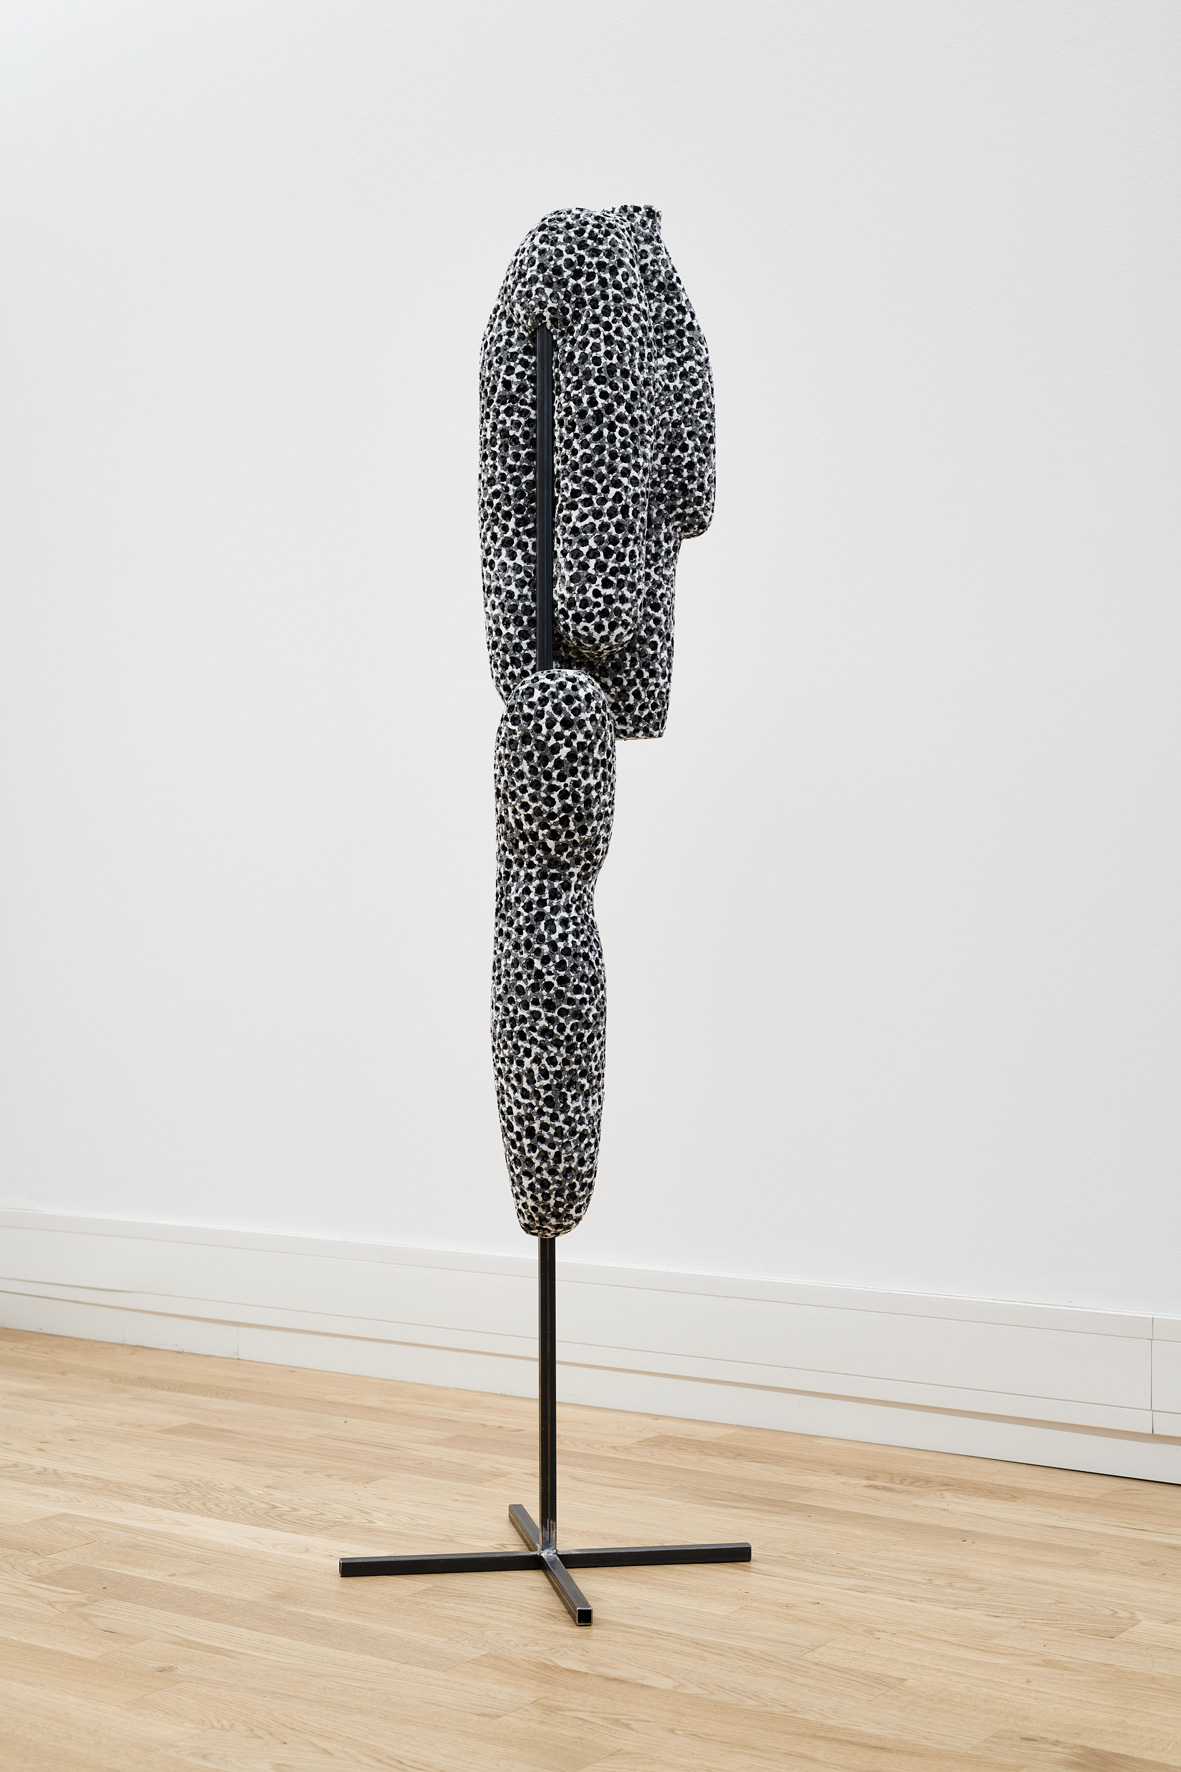 2019.01.08_Galerie-Alber-27.web.jpg